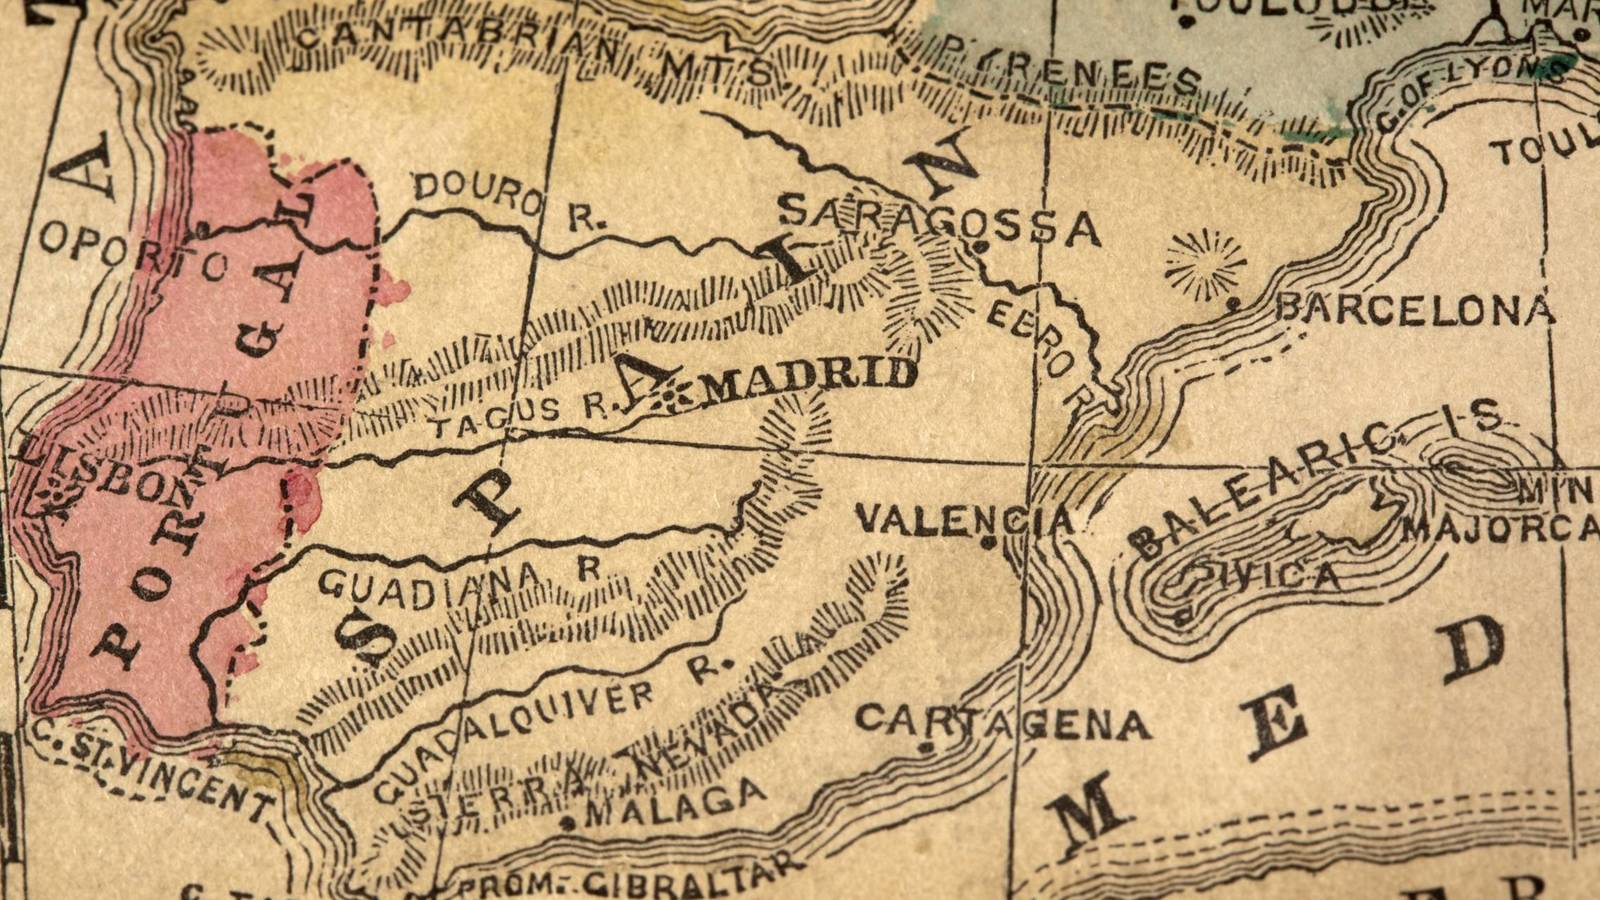 preguntas cortas historia de españa selectividad andalucia examenes historia selectividad andalucia